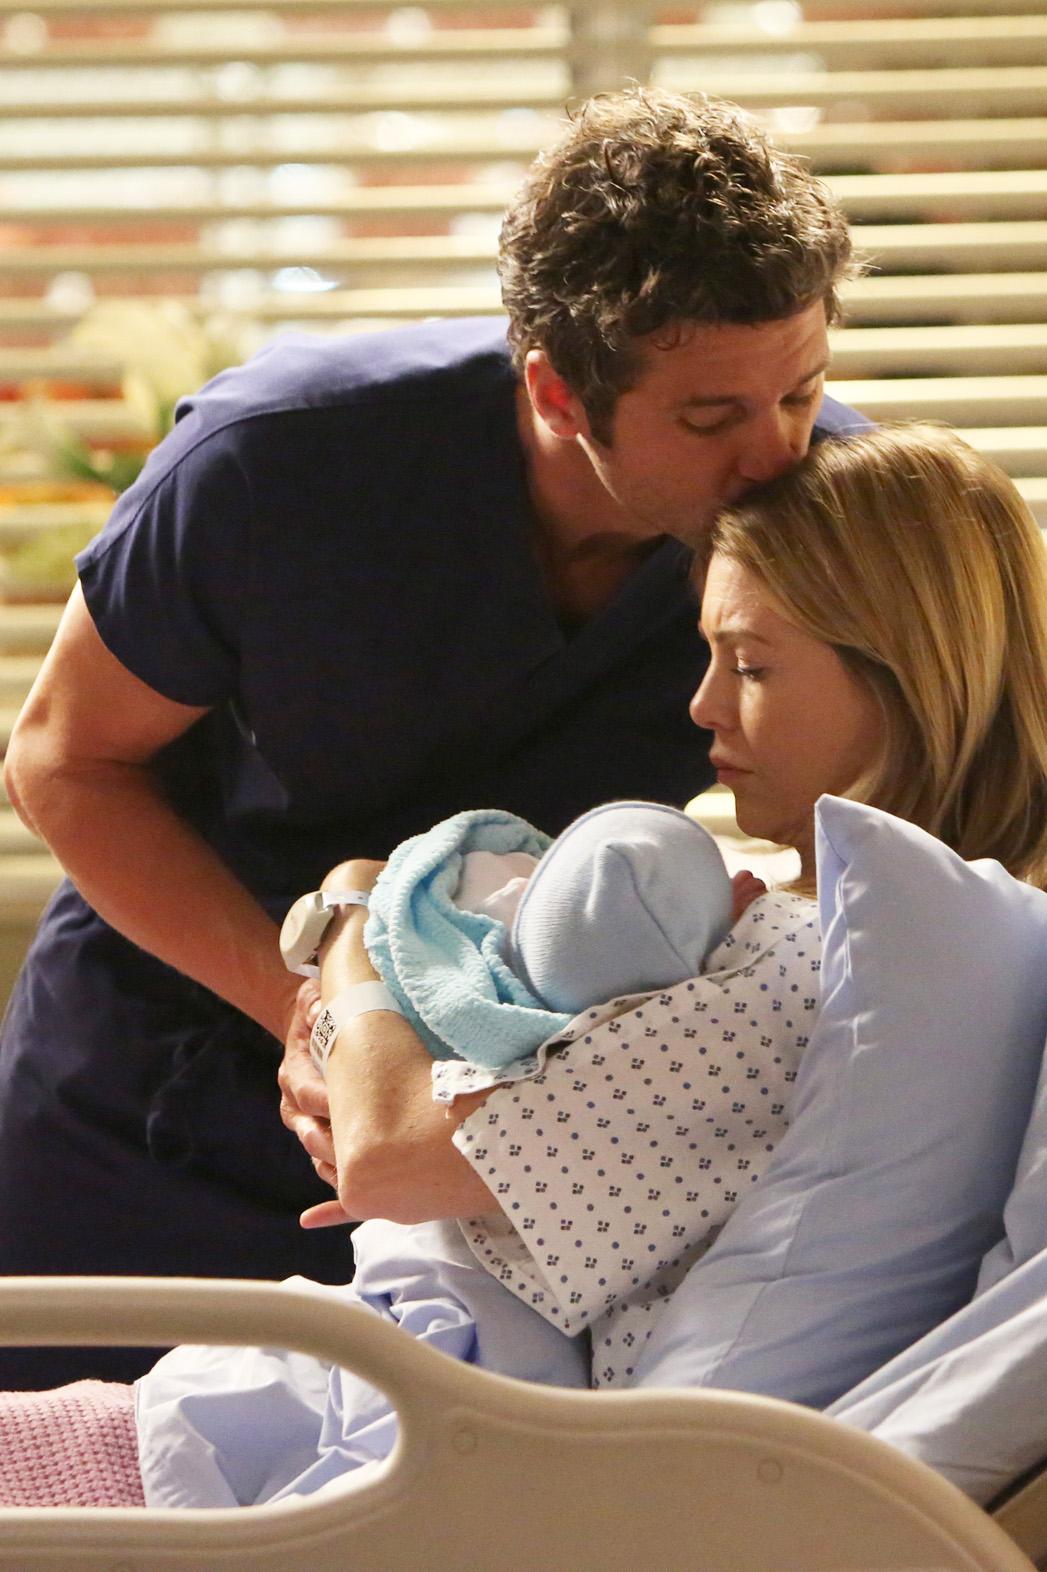 Patrick Dempsey Ellen Pompeo Grey's Anatomy with Baby - P 2014